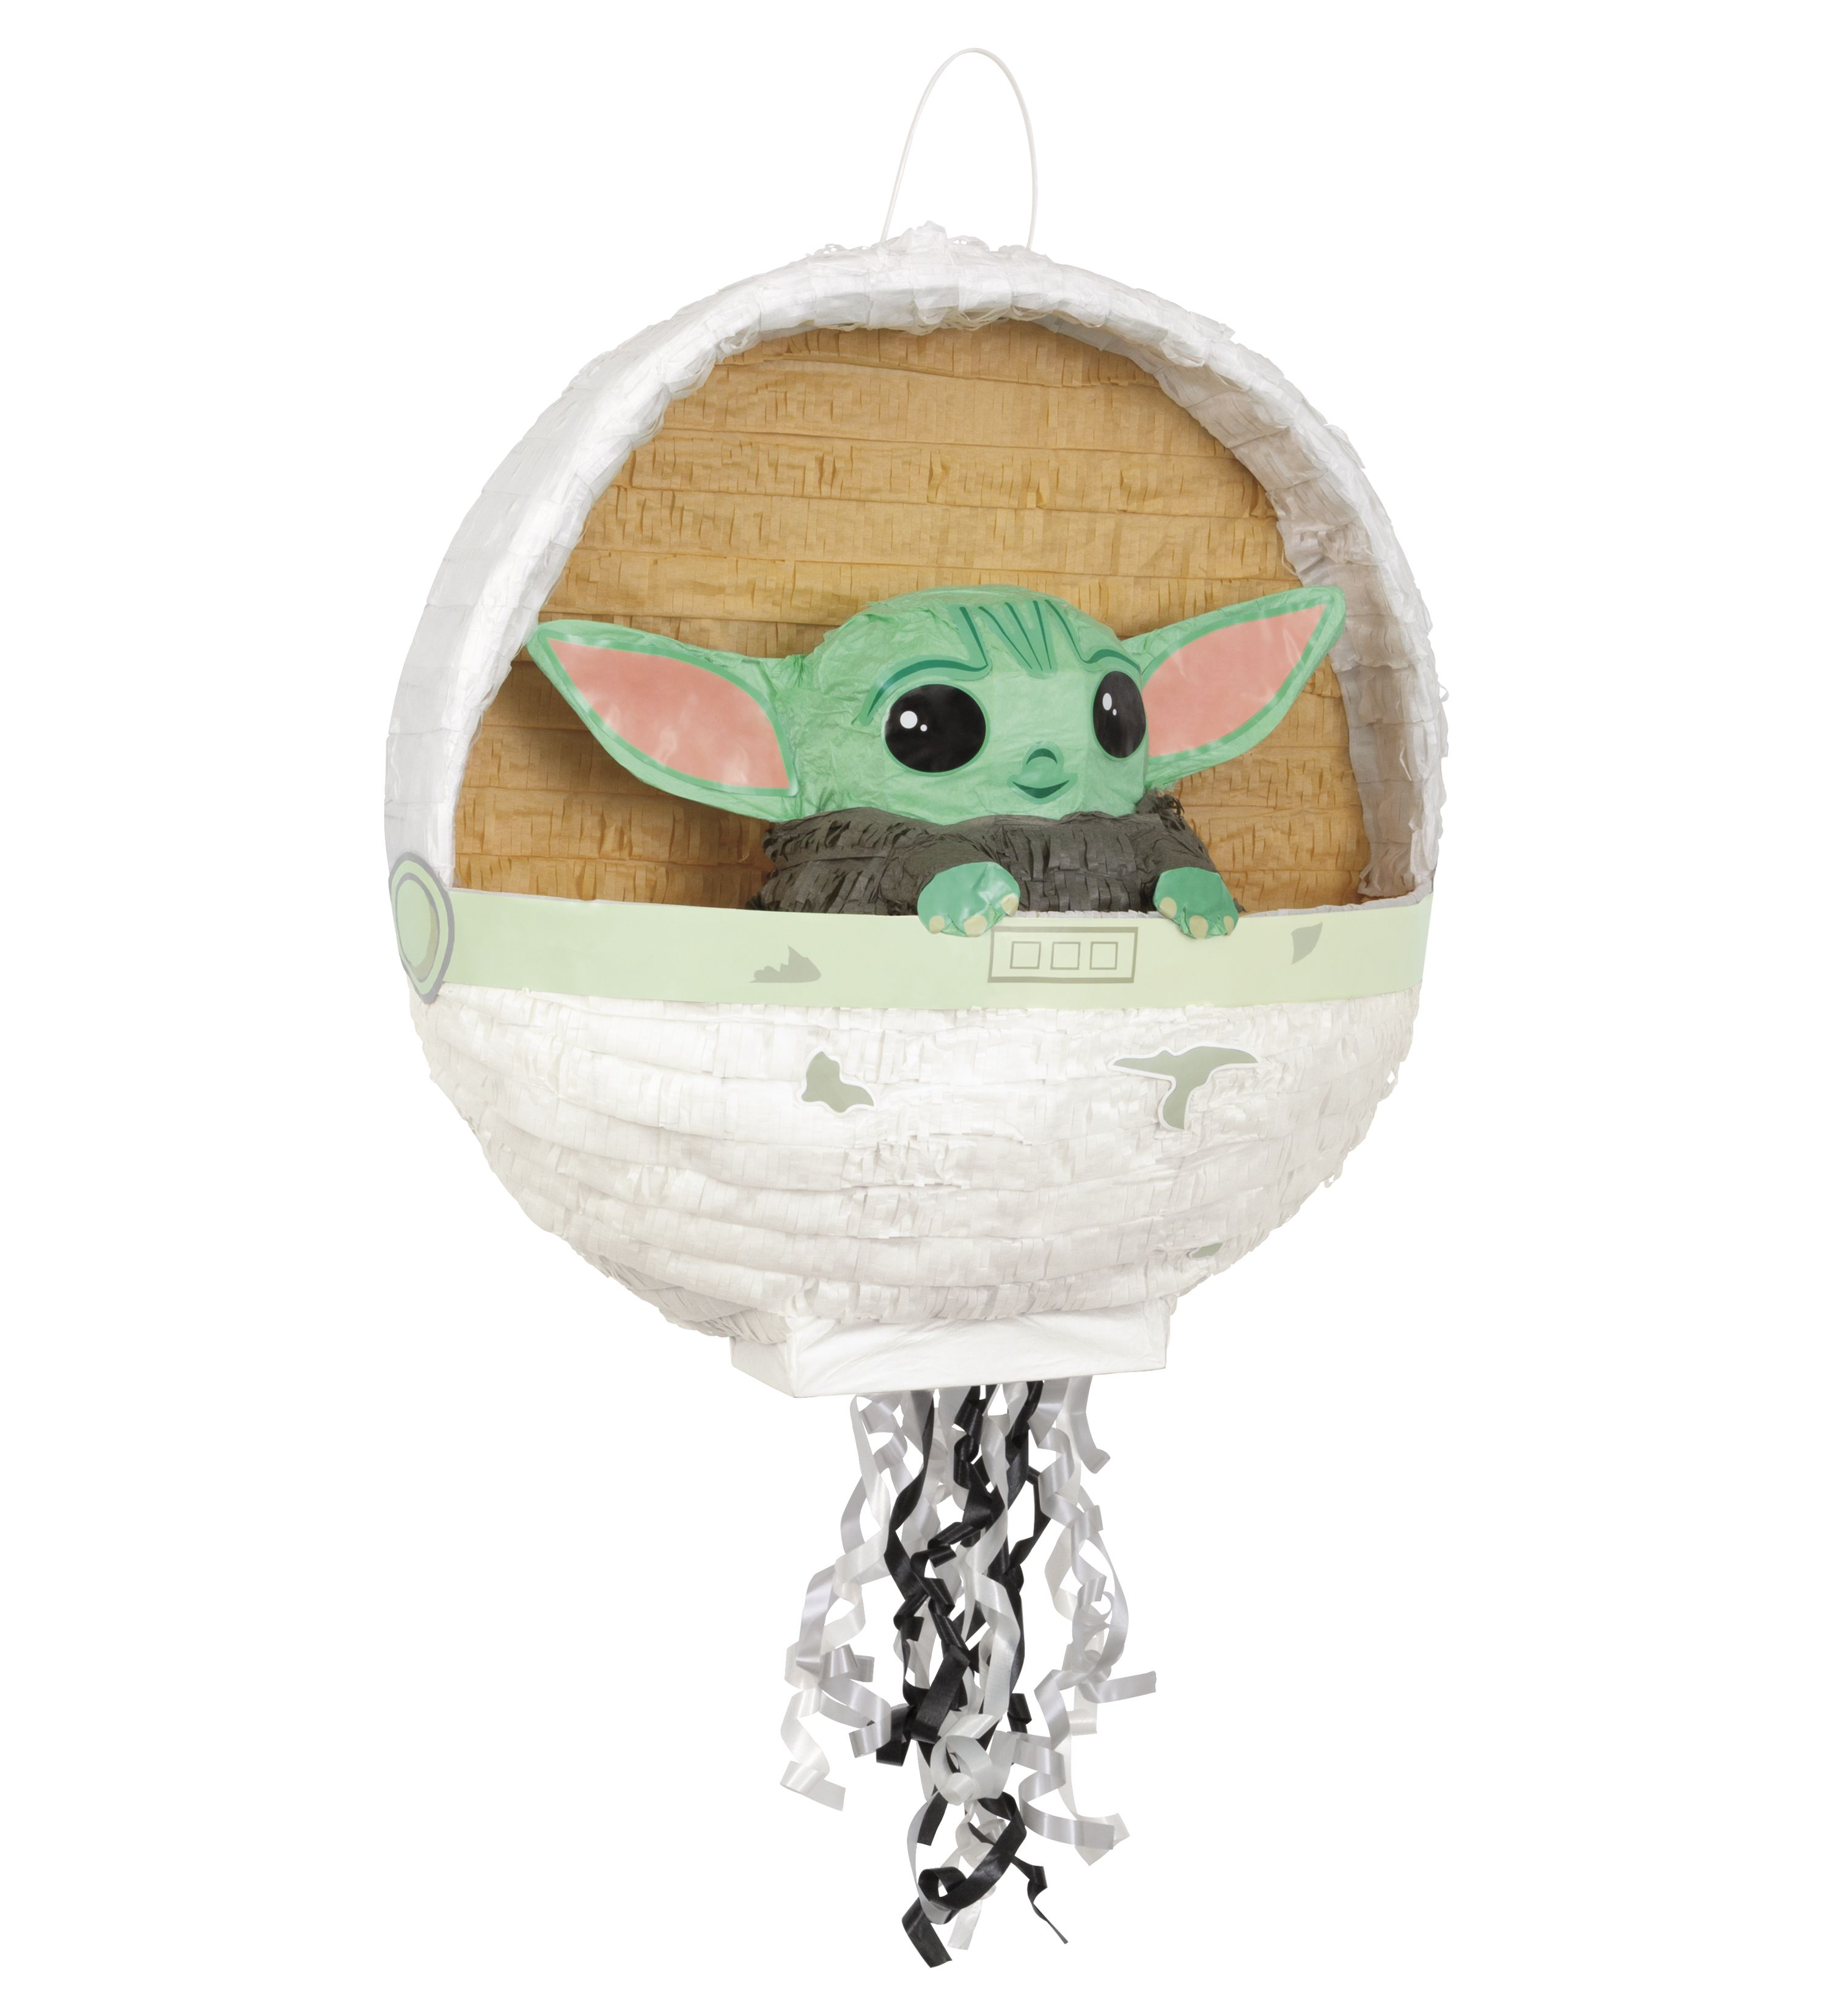 Star Wars Mandalorian the Child 9th Birthday Party Supplies Baby Yoda Balloon...